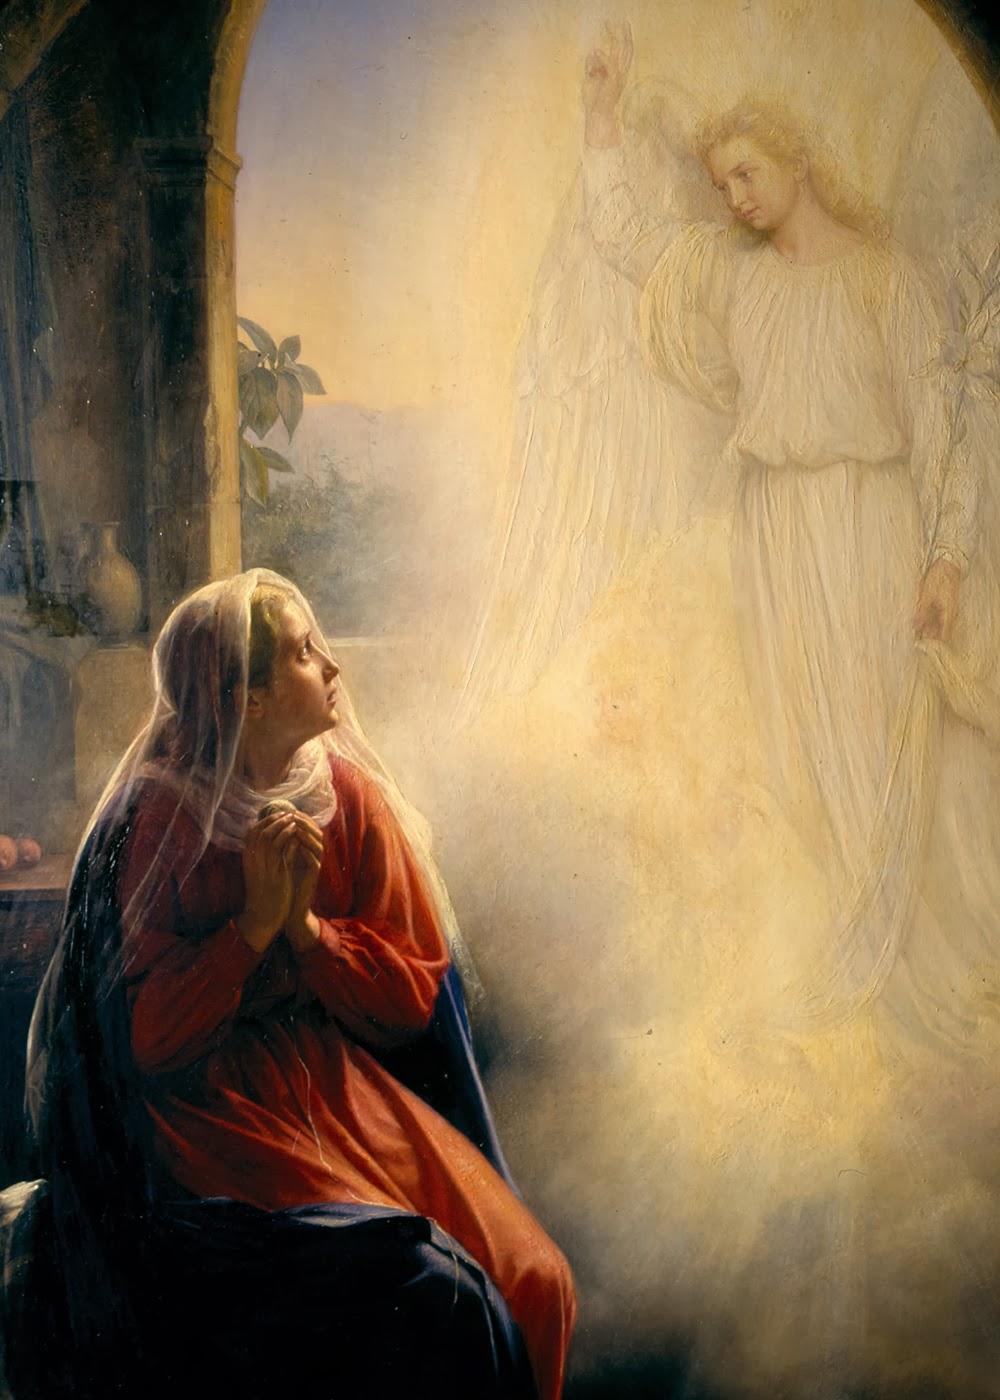 Whom shall i send send me lord genesis 39 15 20 ephesians 13 genesis 39 15 20 ephesians 13 6 11 12 psalm 981 4 luke 126 38 sciox Choice Image